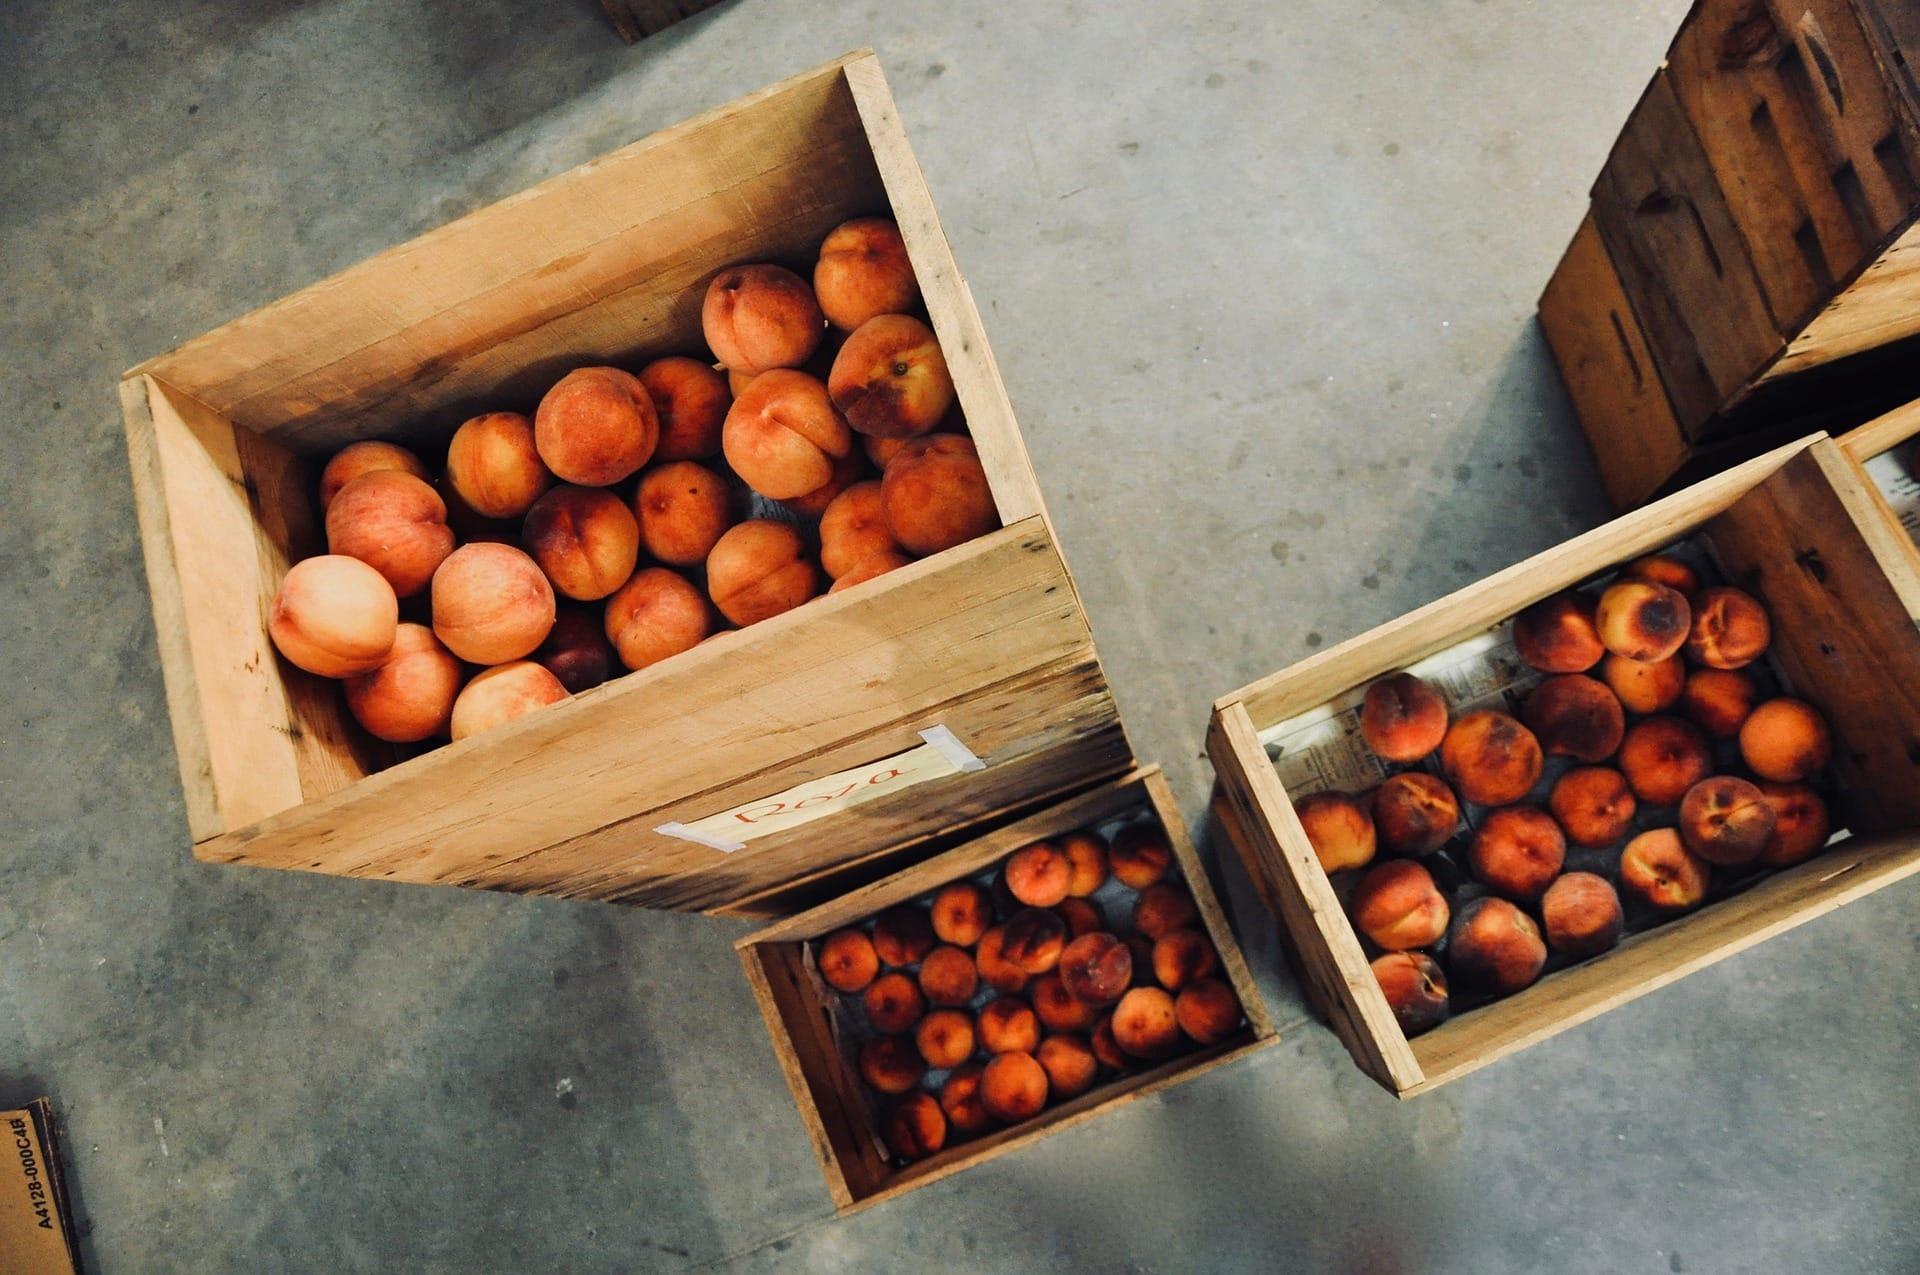 embedded deductible | peach box stacks